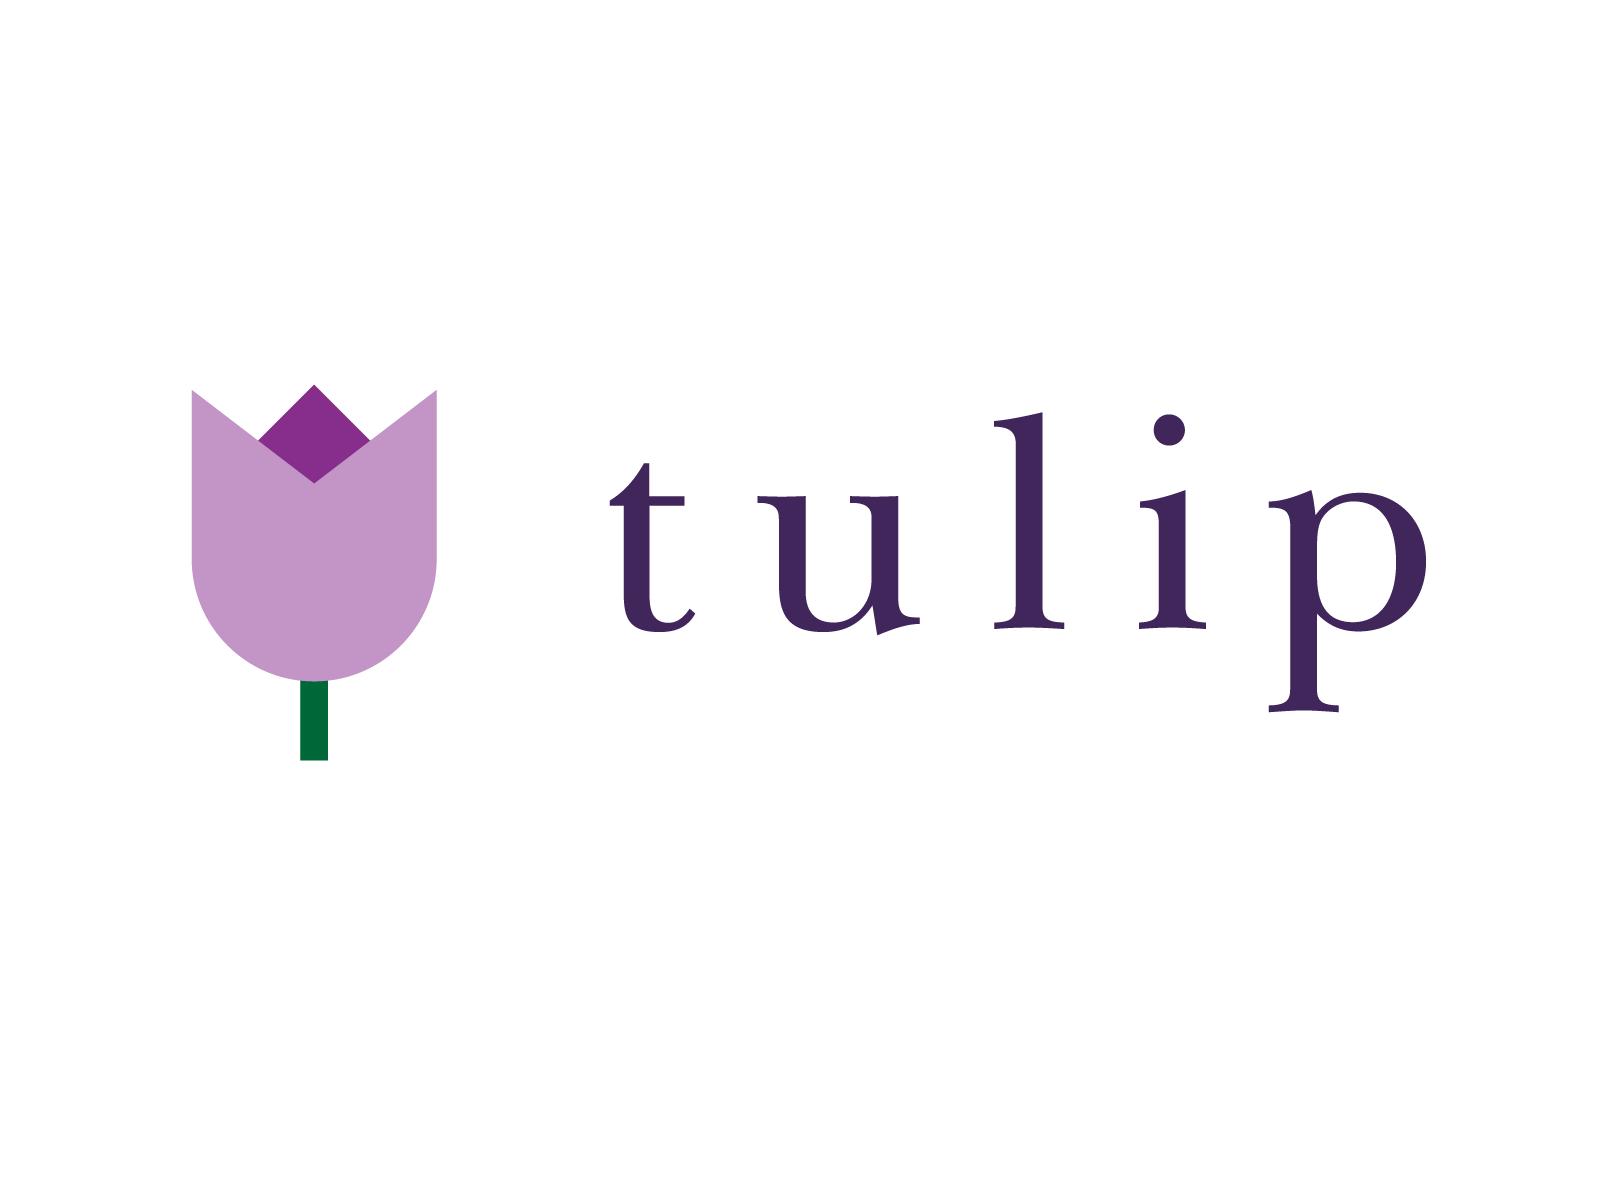 Tulip dribbble 13